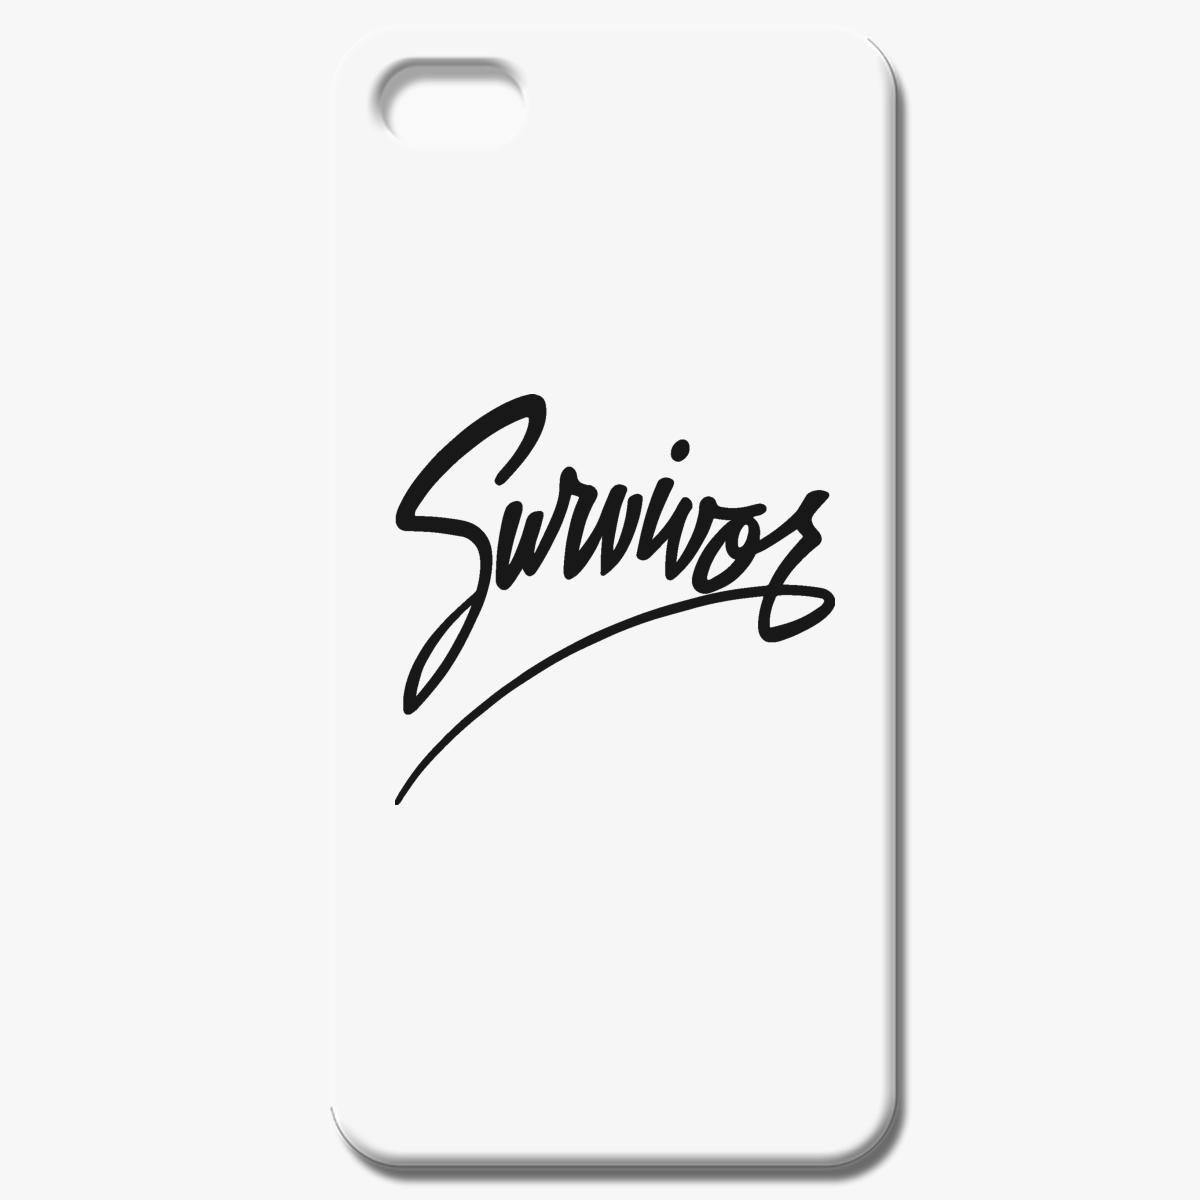 Survivor Band Logo Iphone 8 Case